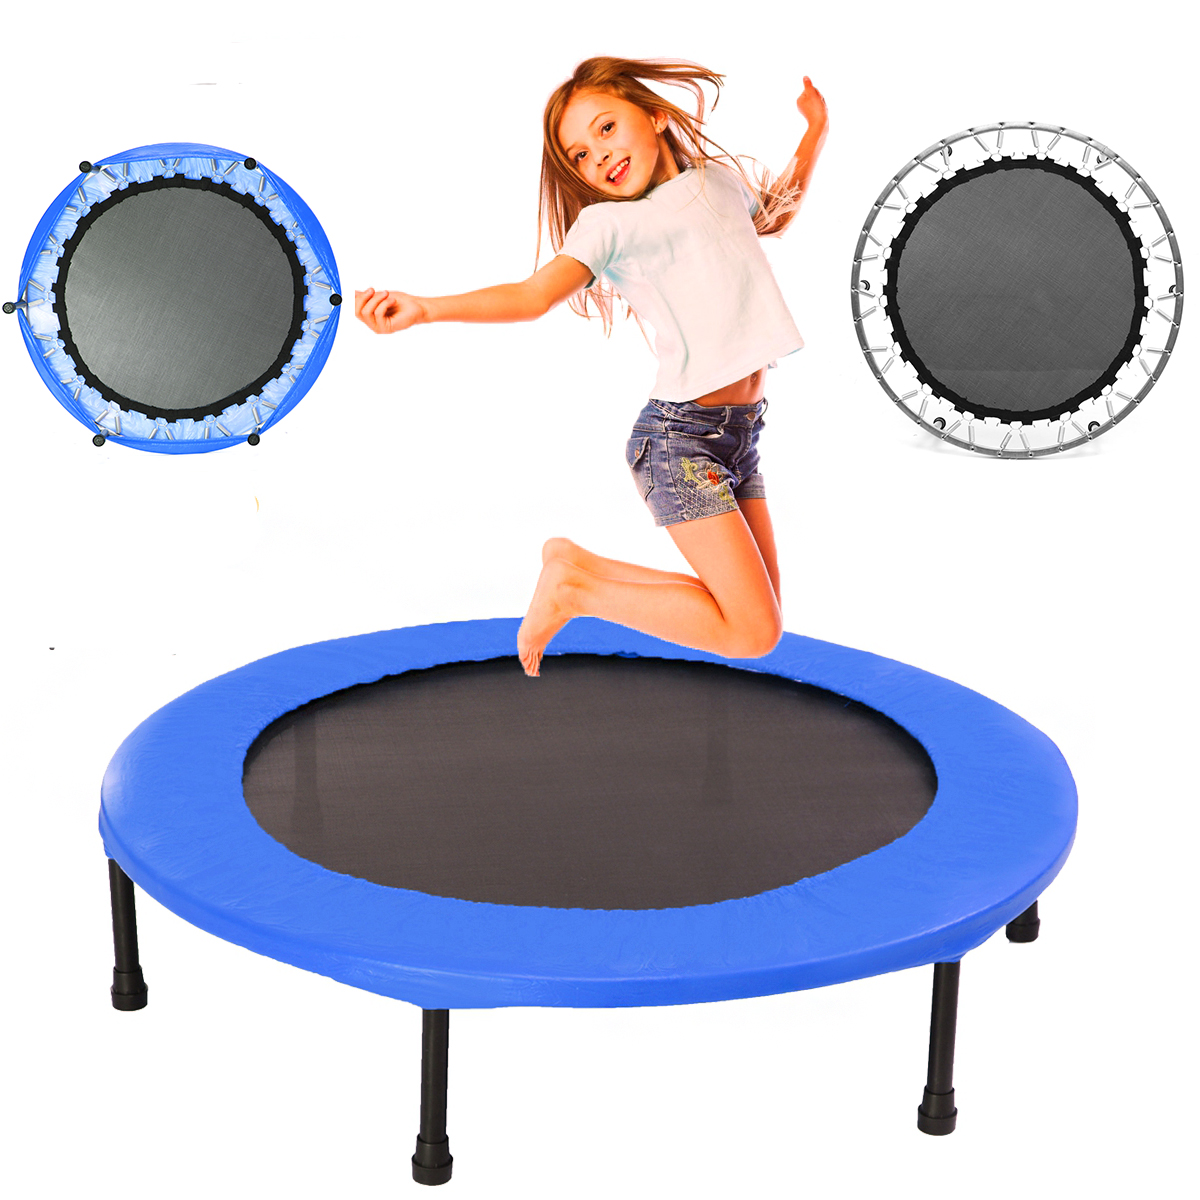 40inch Round Kids Mini Trampoline